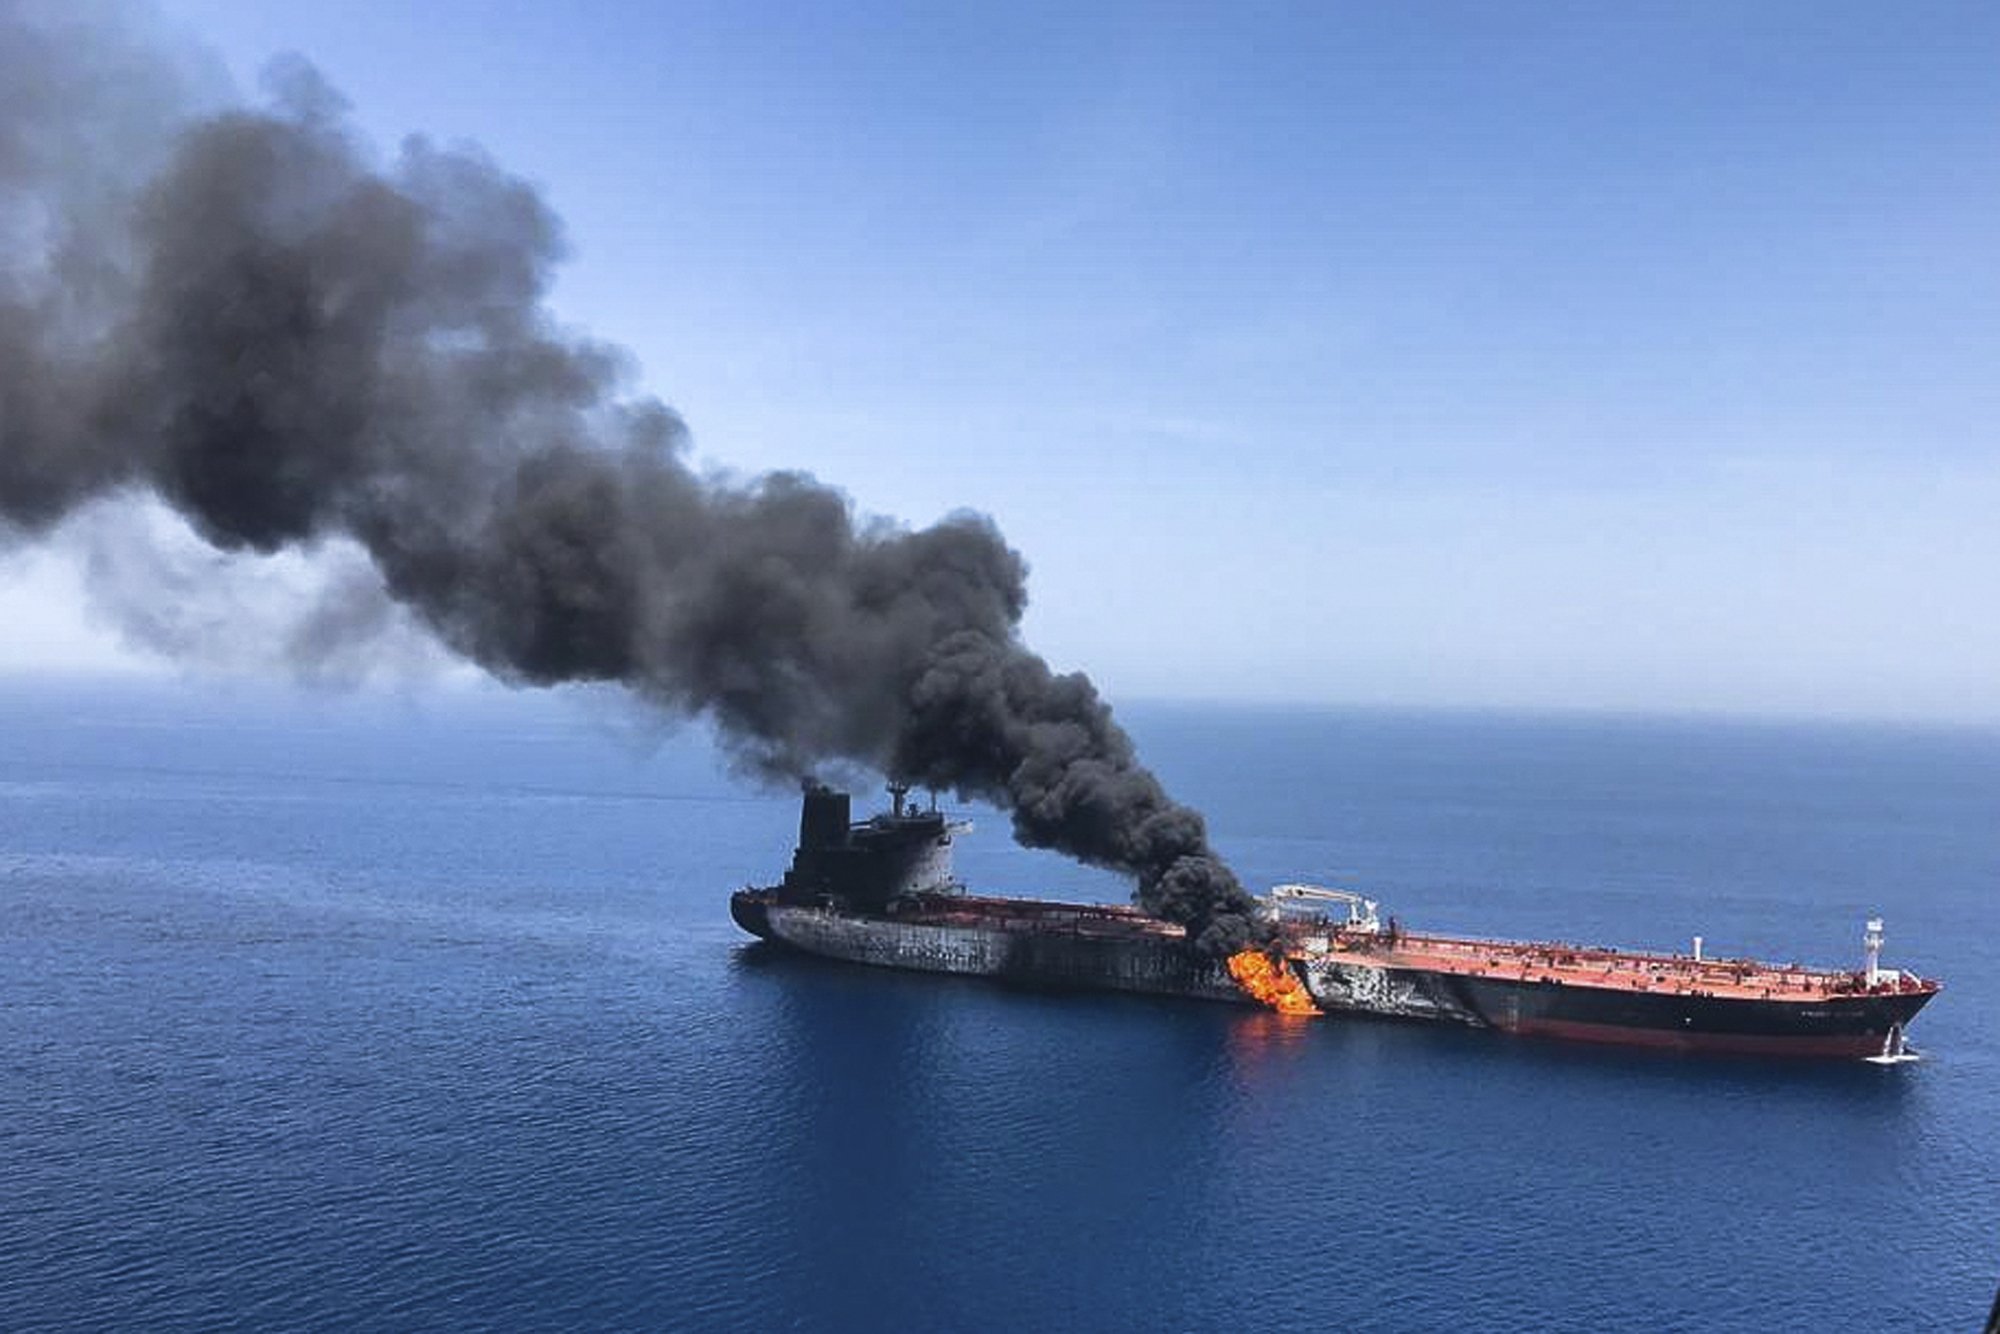 Iran_Persian_Gulf_Tensions_24956-159532.jpg12288590